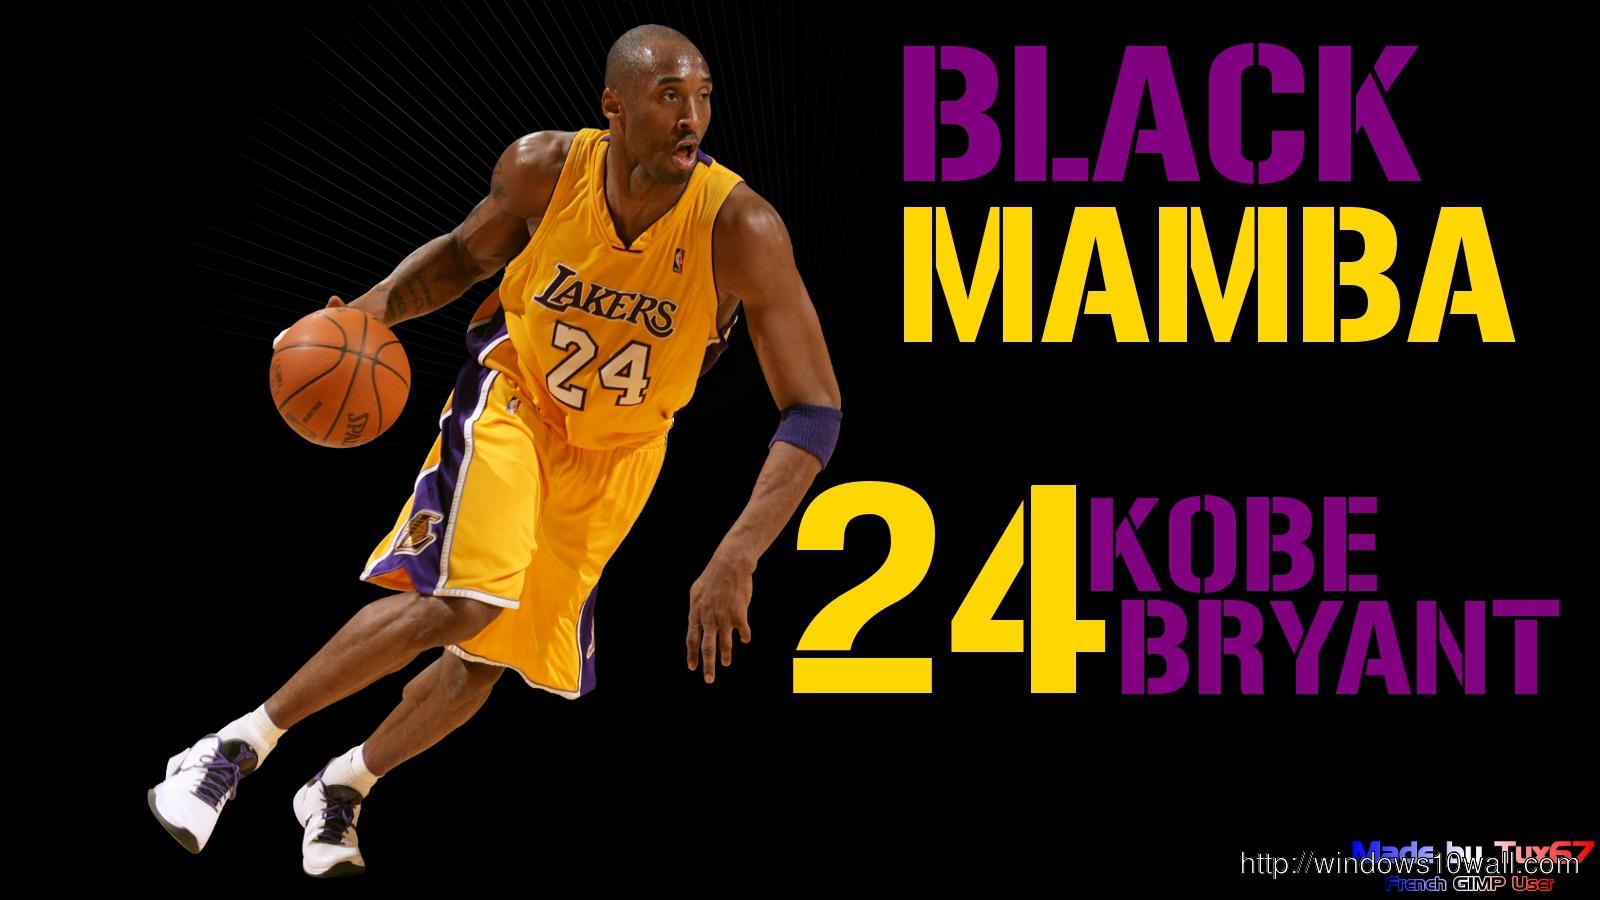 New Los Angeles Lakers Kobe Bryant Hd Wallpaper Windows 10 Wallpapers